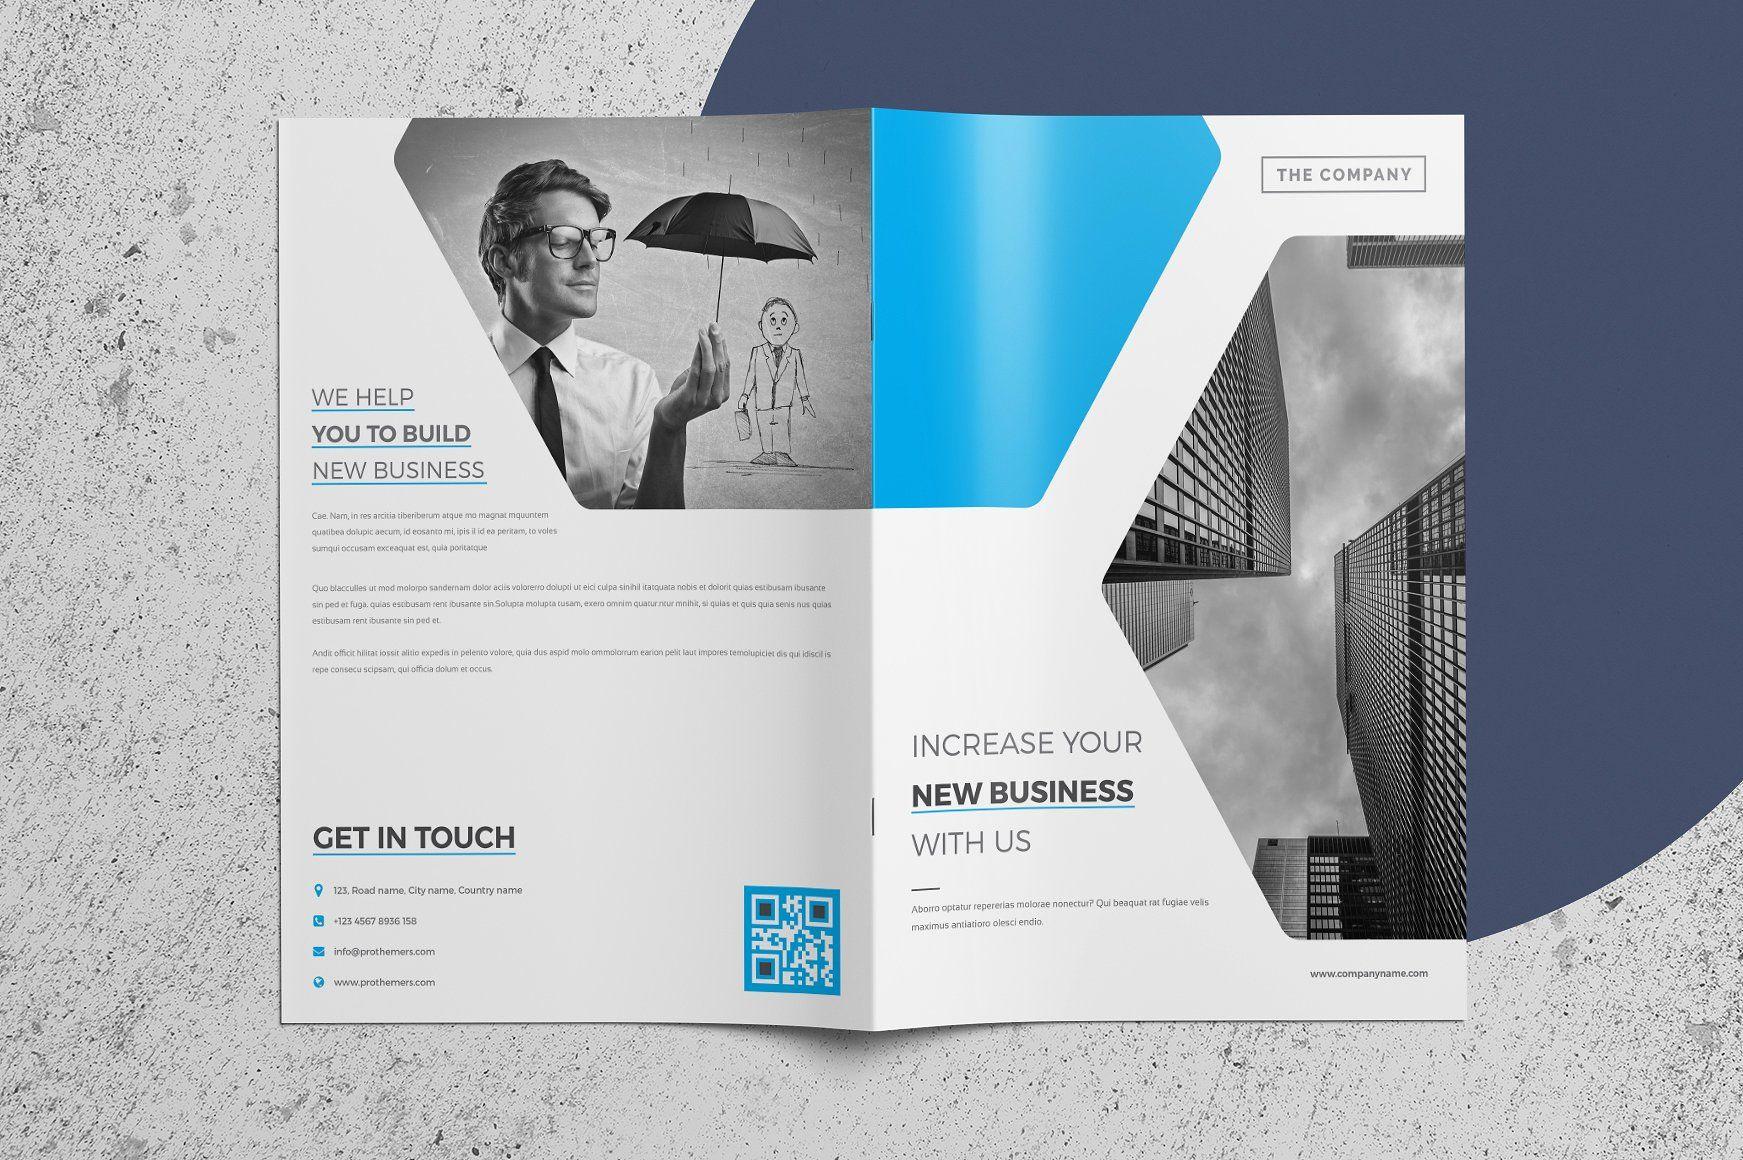 Corporate Company Brochure 4 Page By Nashoaib On Creativemarket Brochure Design Inspiration Templates Brochure Design Template Brochure Print